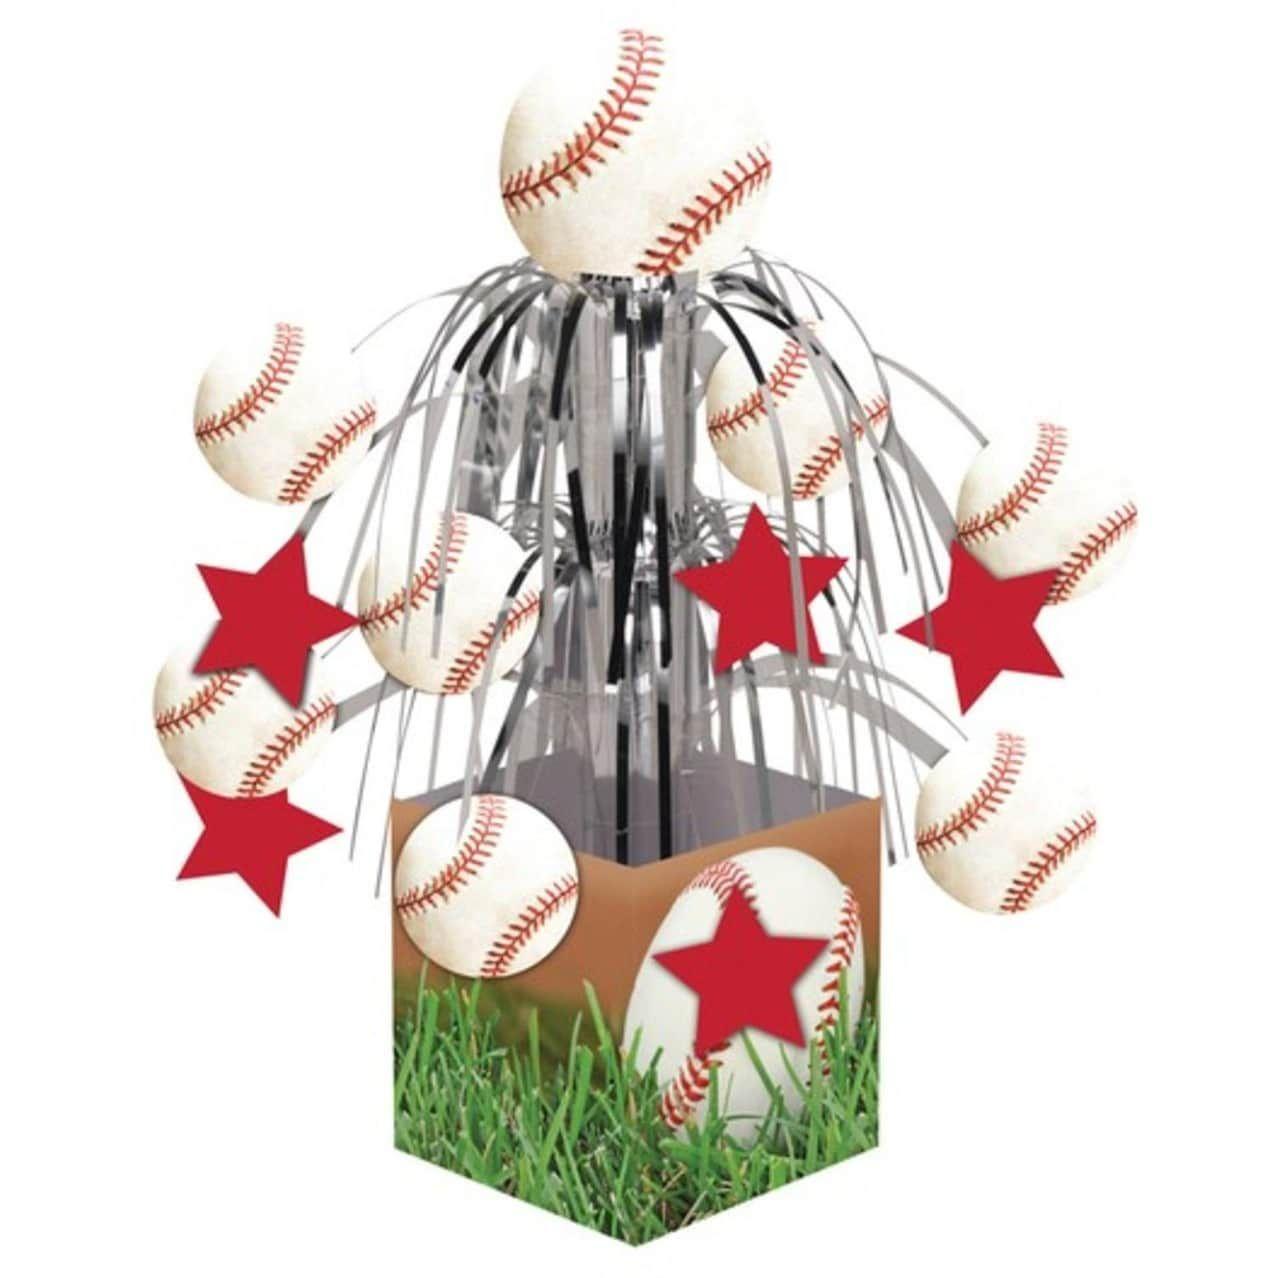 Pack Of 6 Baseball Sports Fanatic Mini Cascade Foil